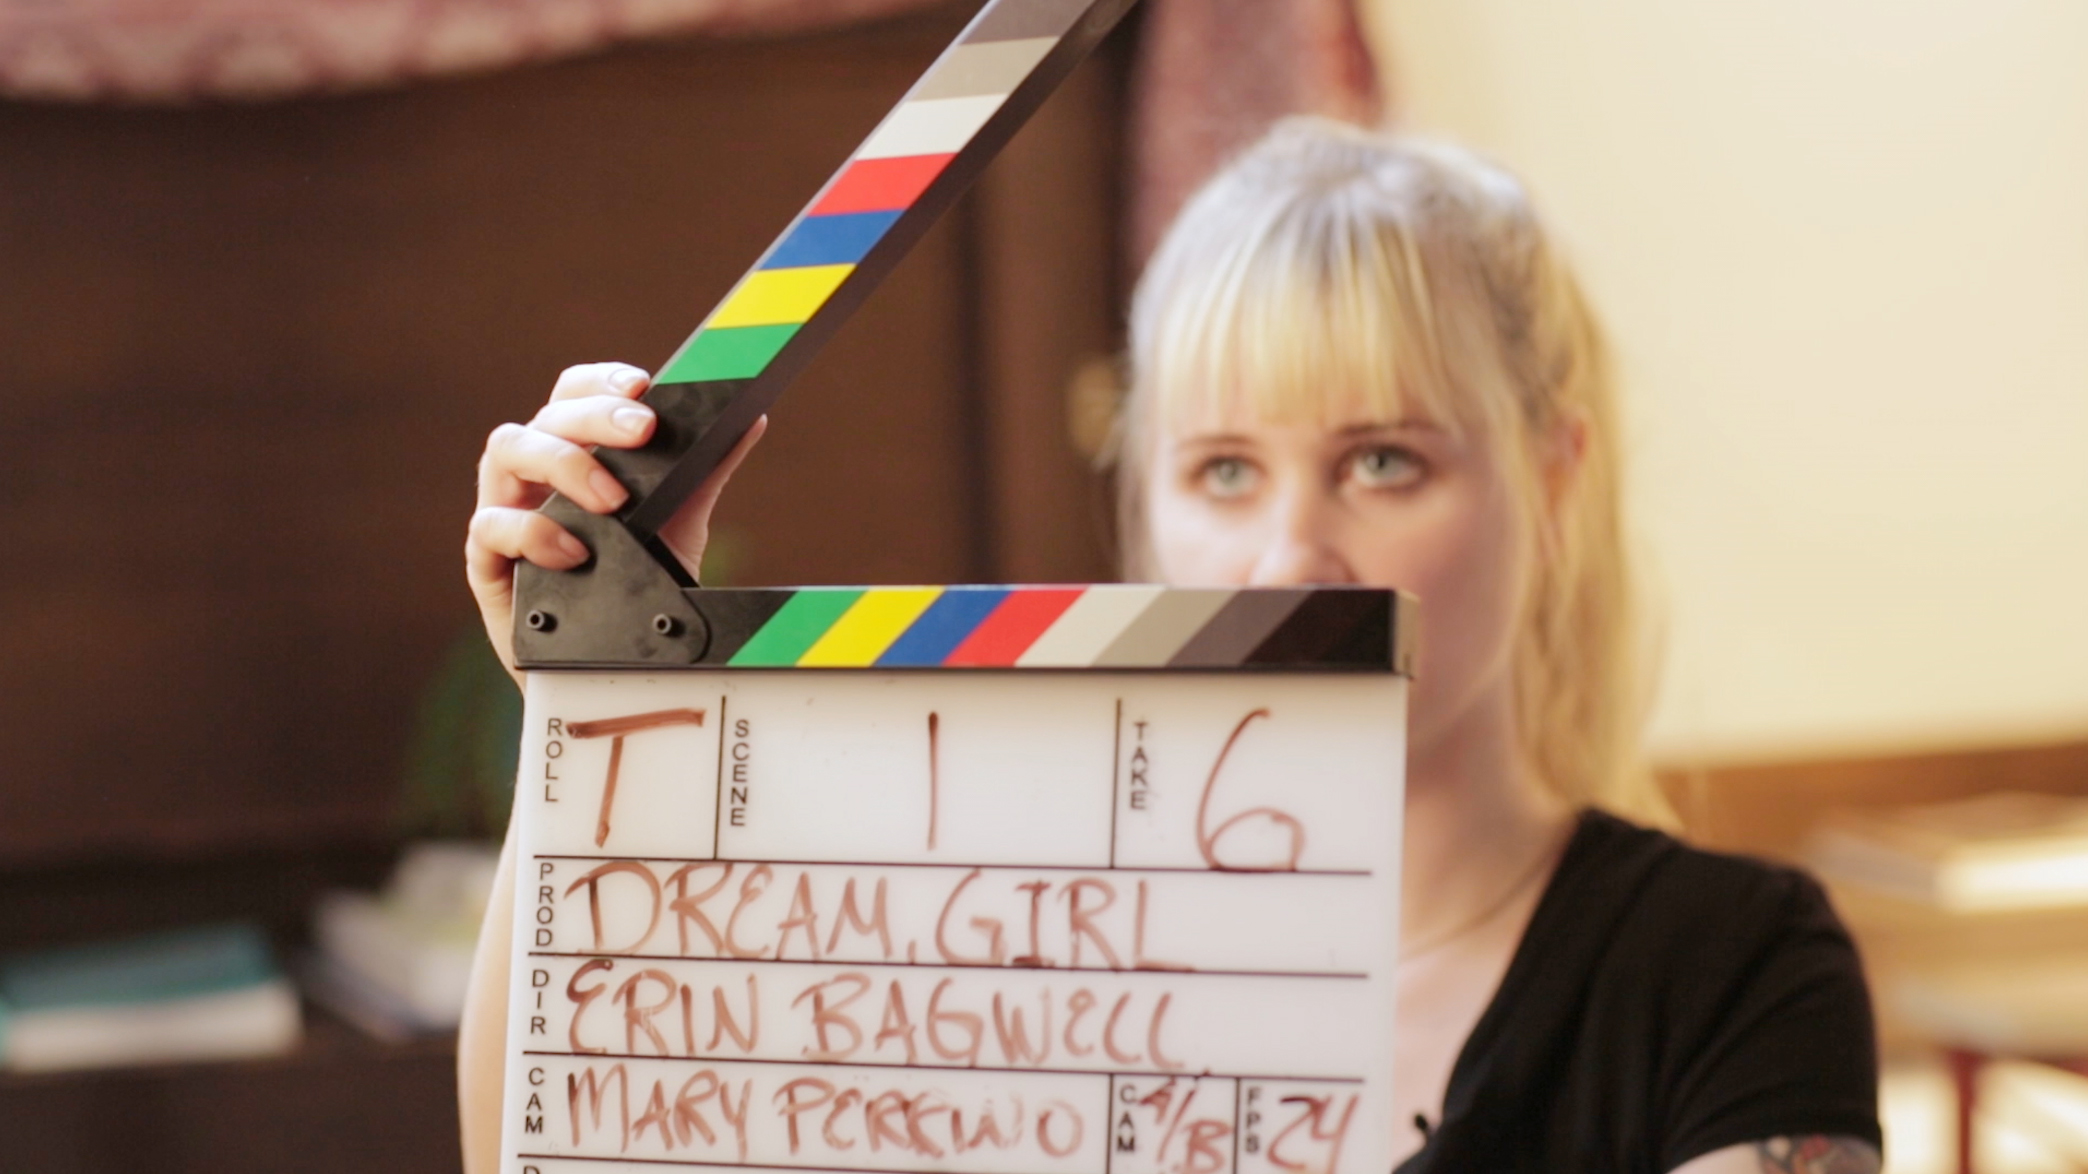 Dream, Girl Still 17 featuring Erin Bagwell